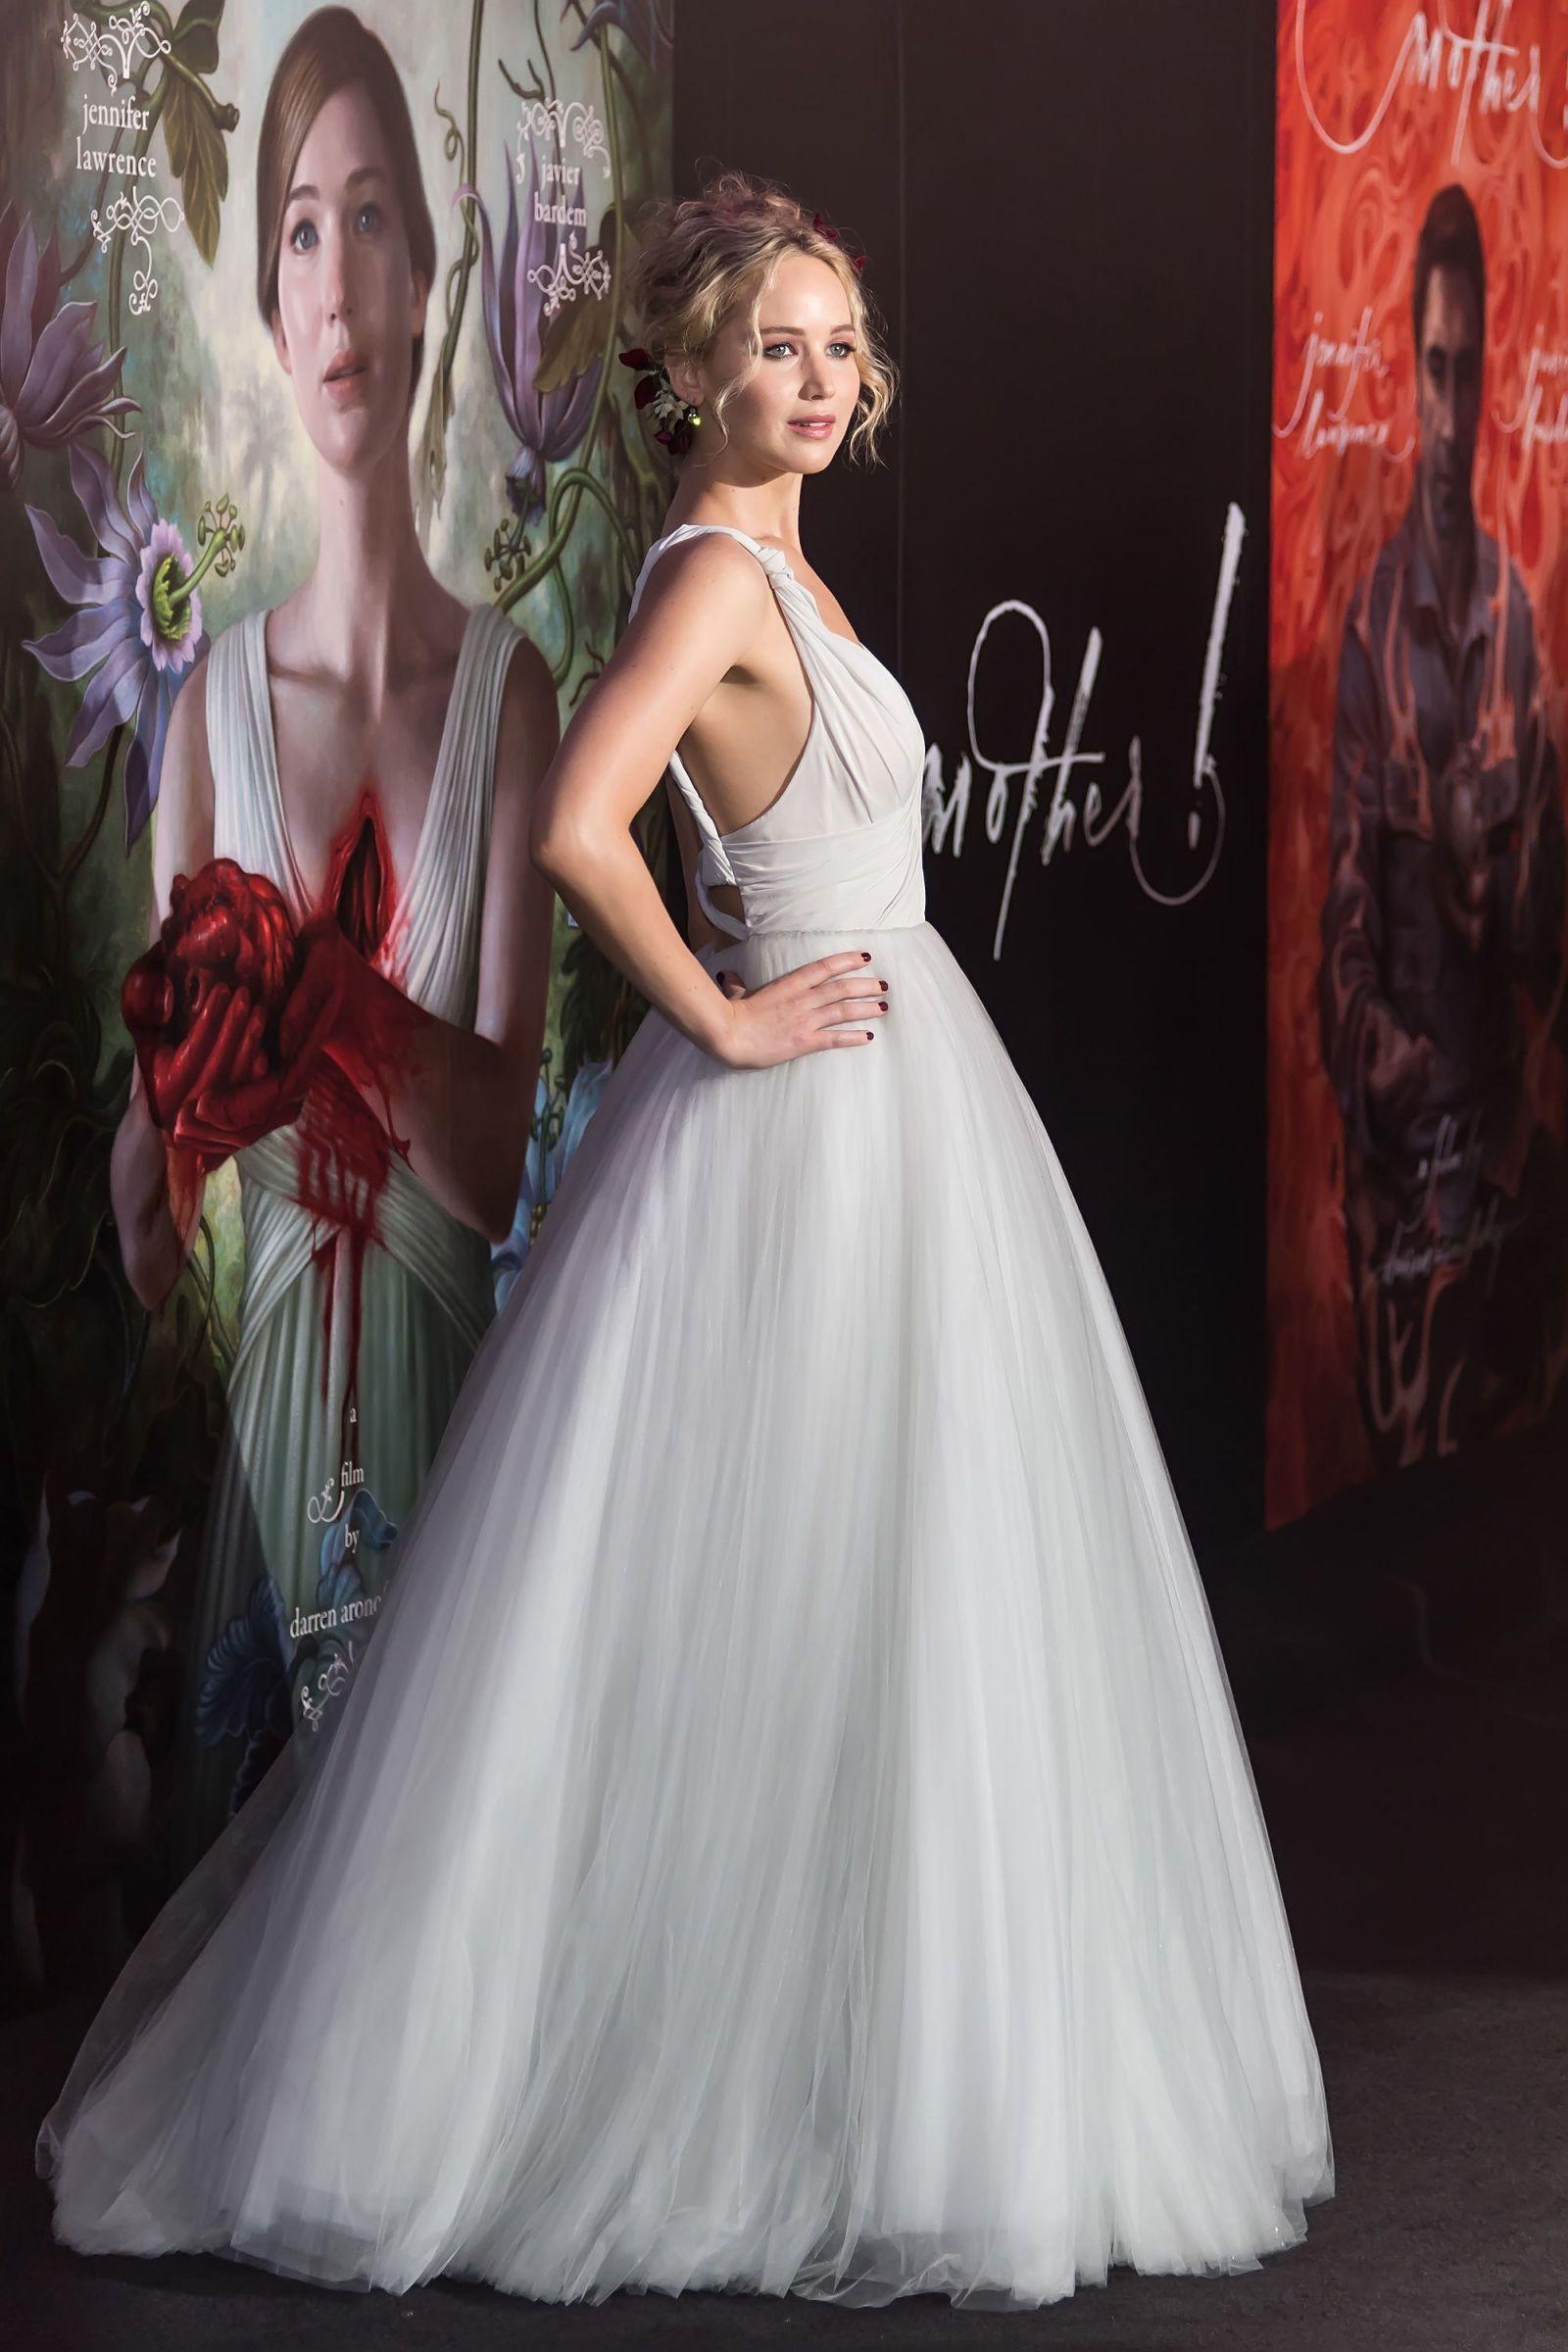 jennifer lawrence wedding - HD1600×2400